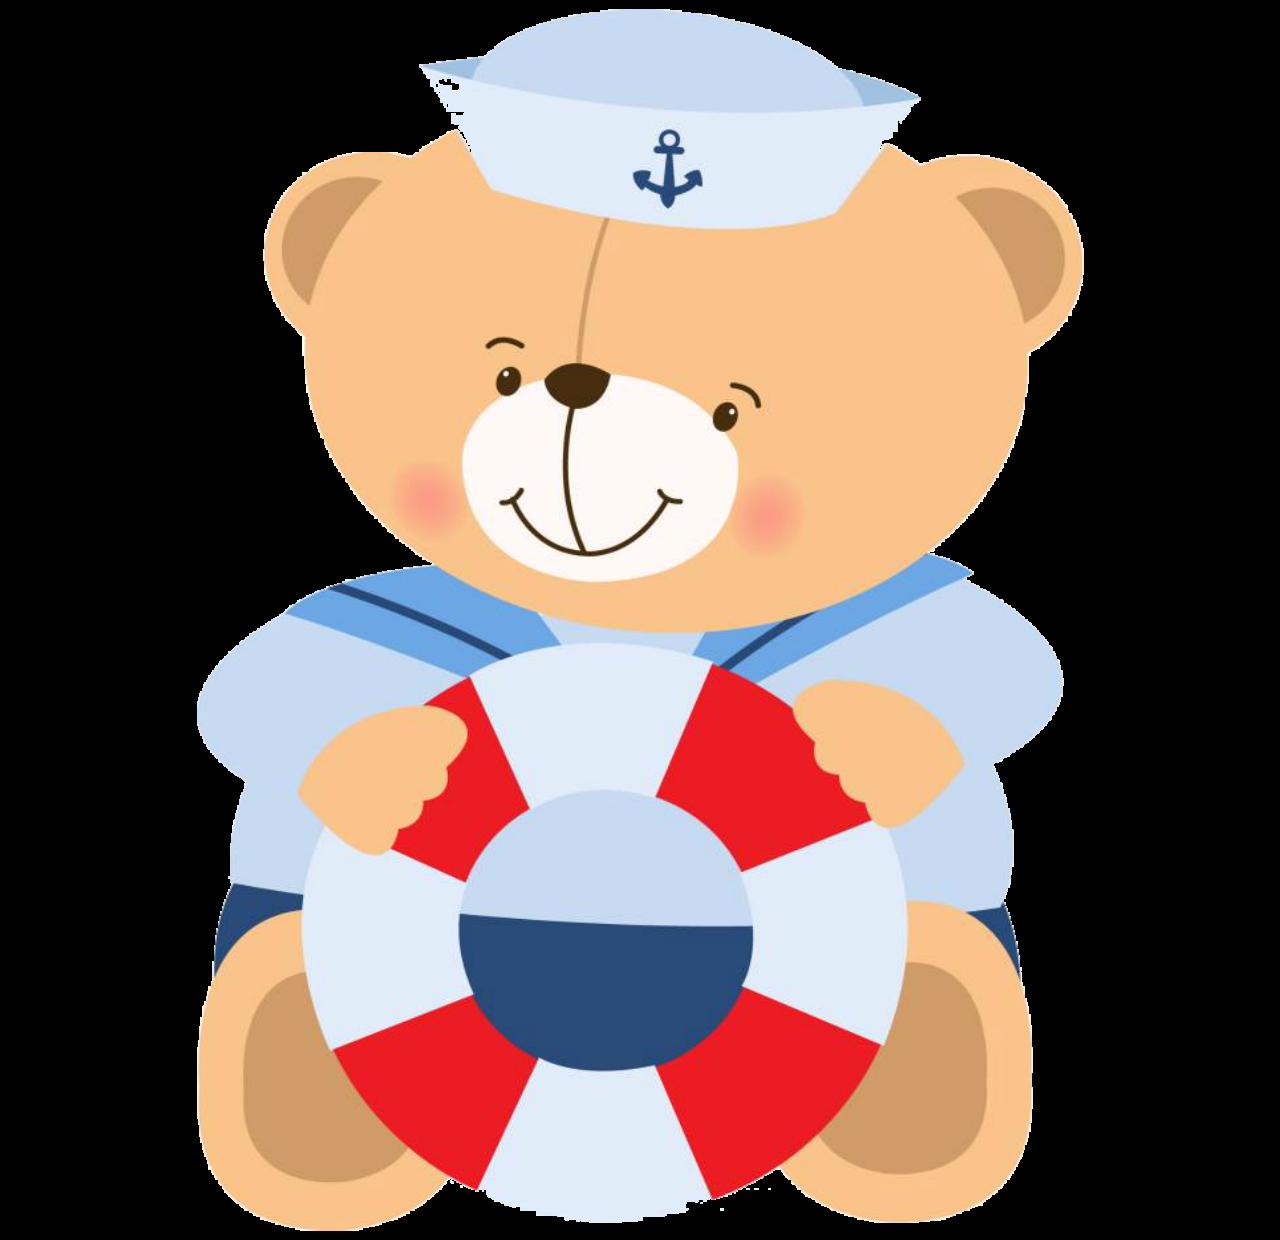 graphic transparent Baptism clipart pretty baby. Sailor bear png imagenes.